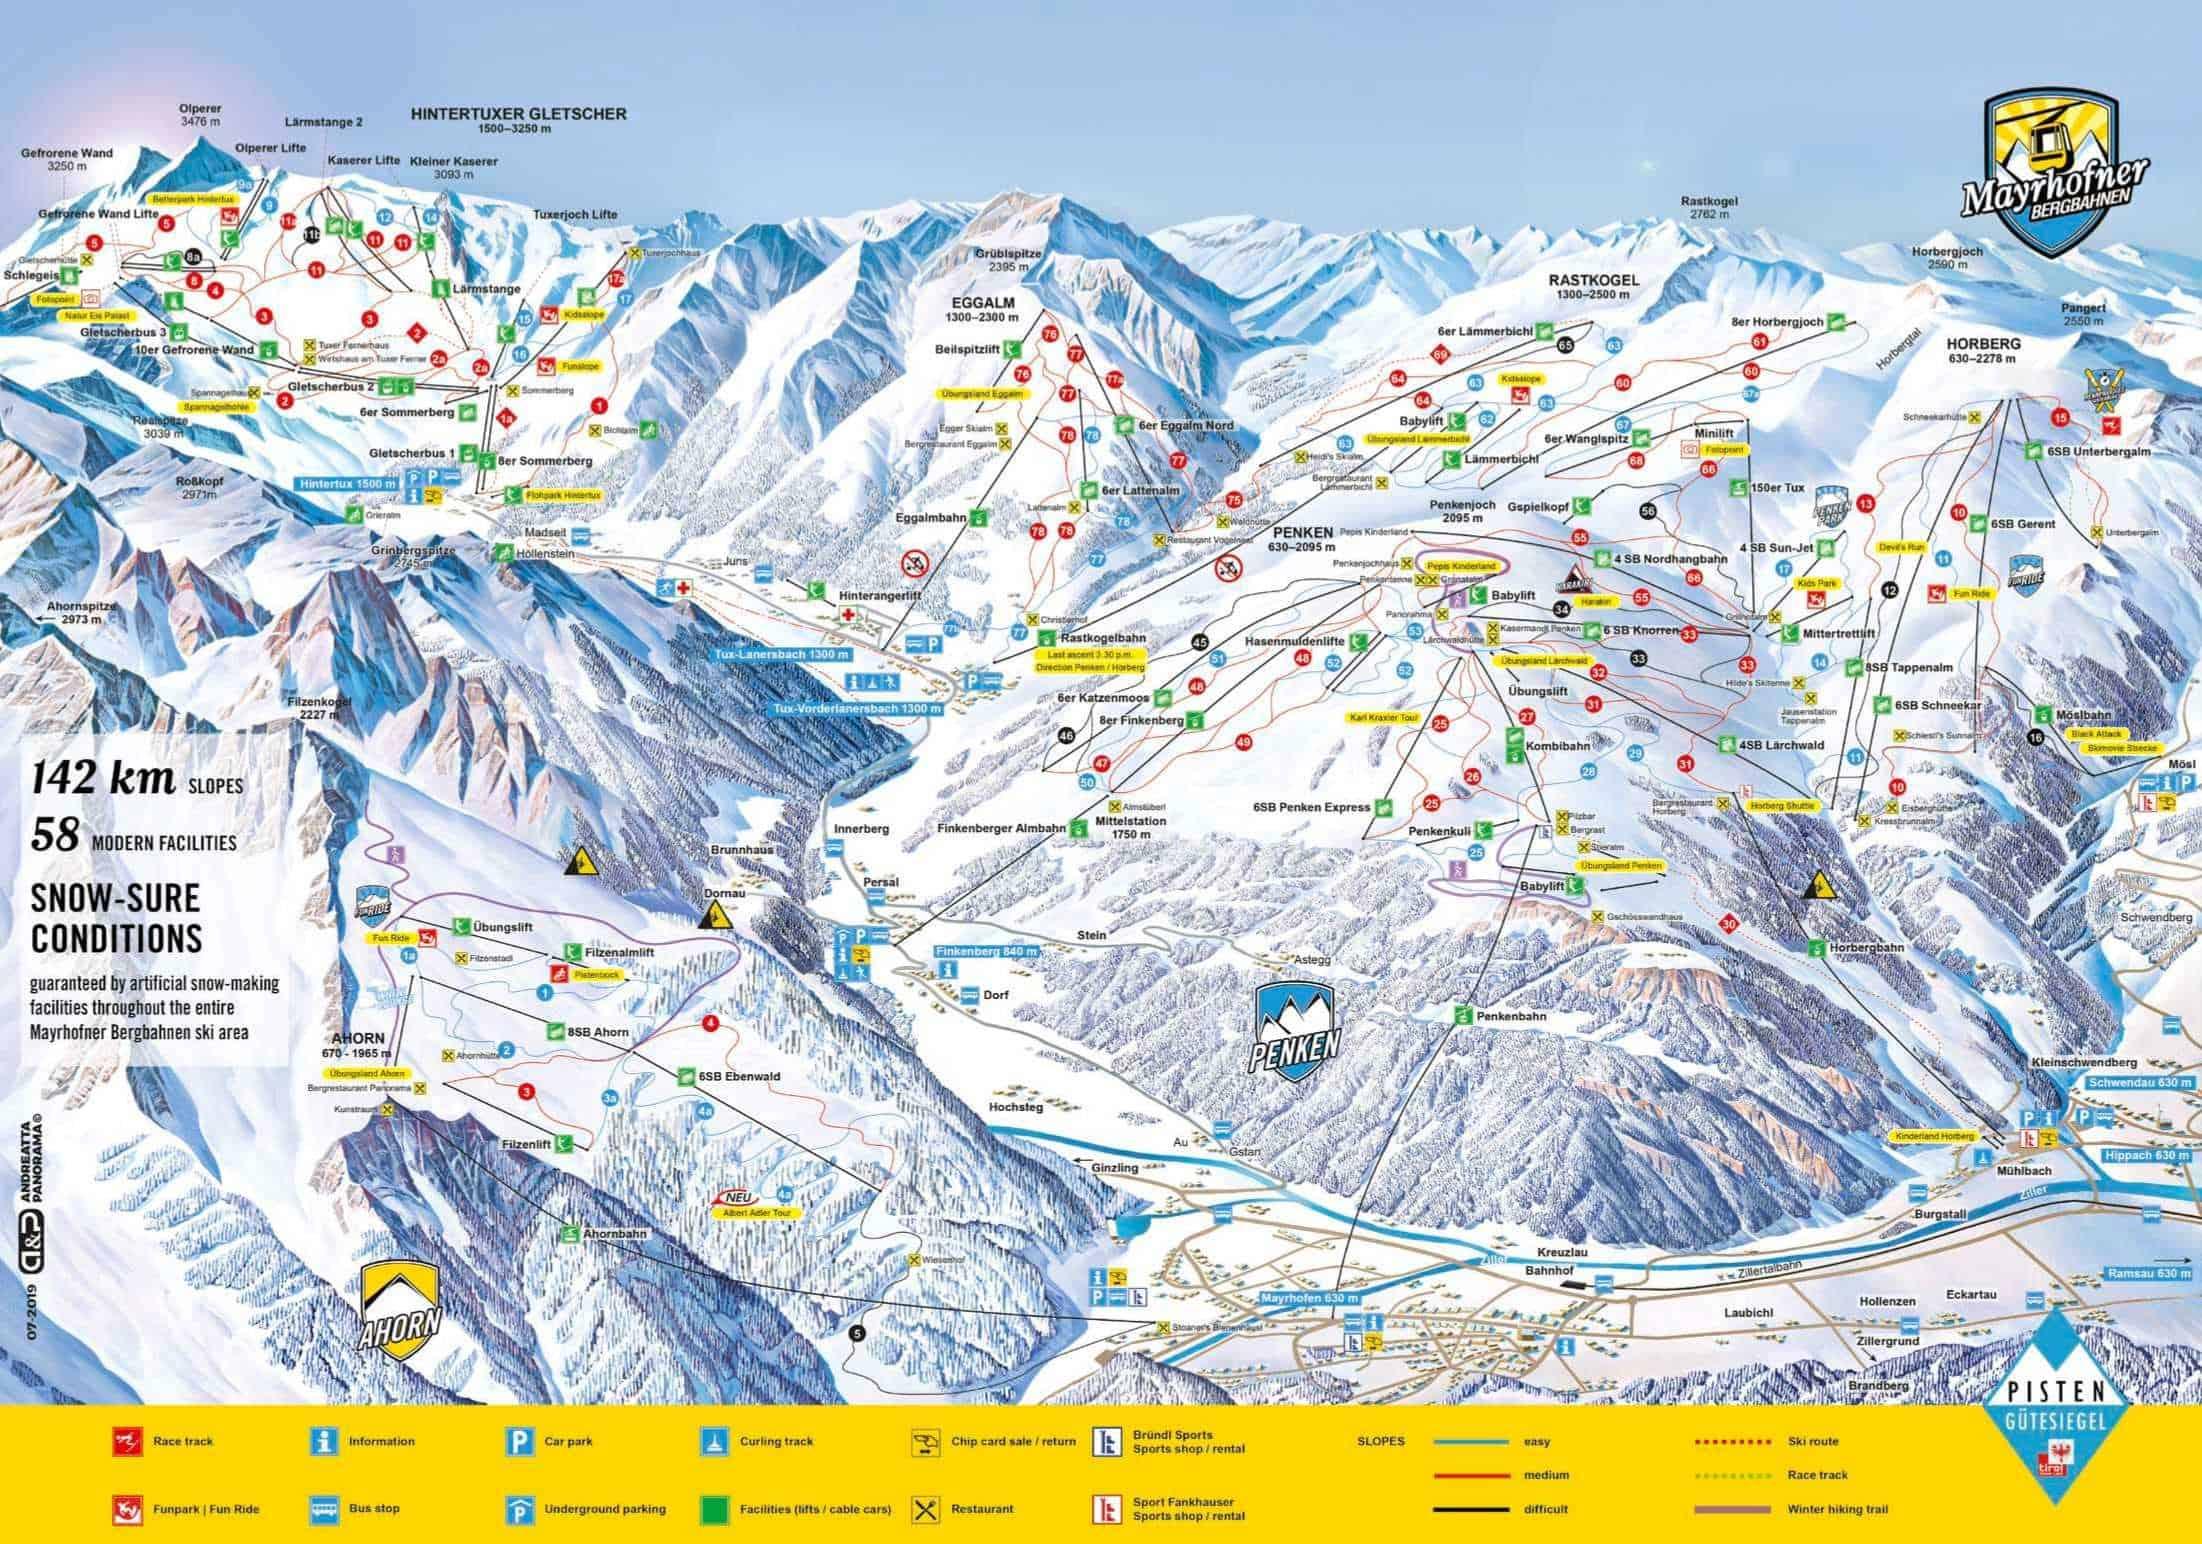 Mayrhofen JPG optimized